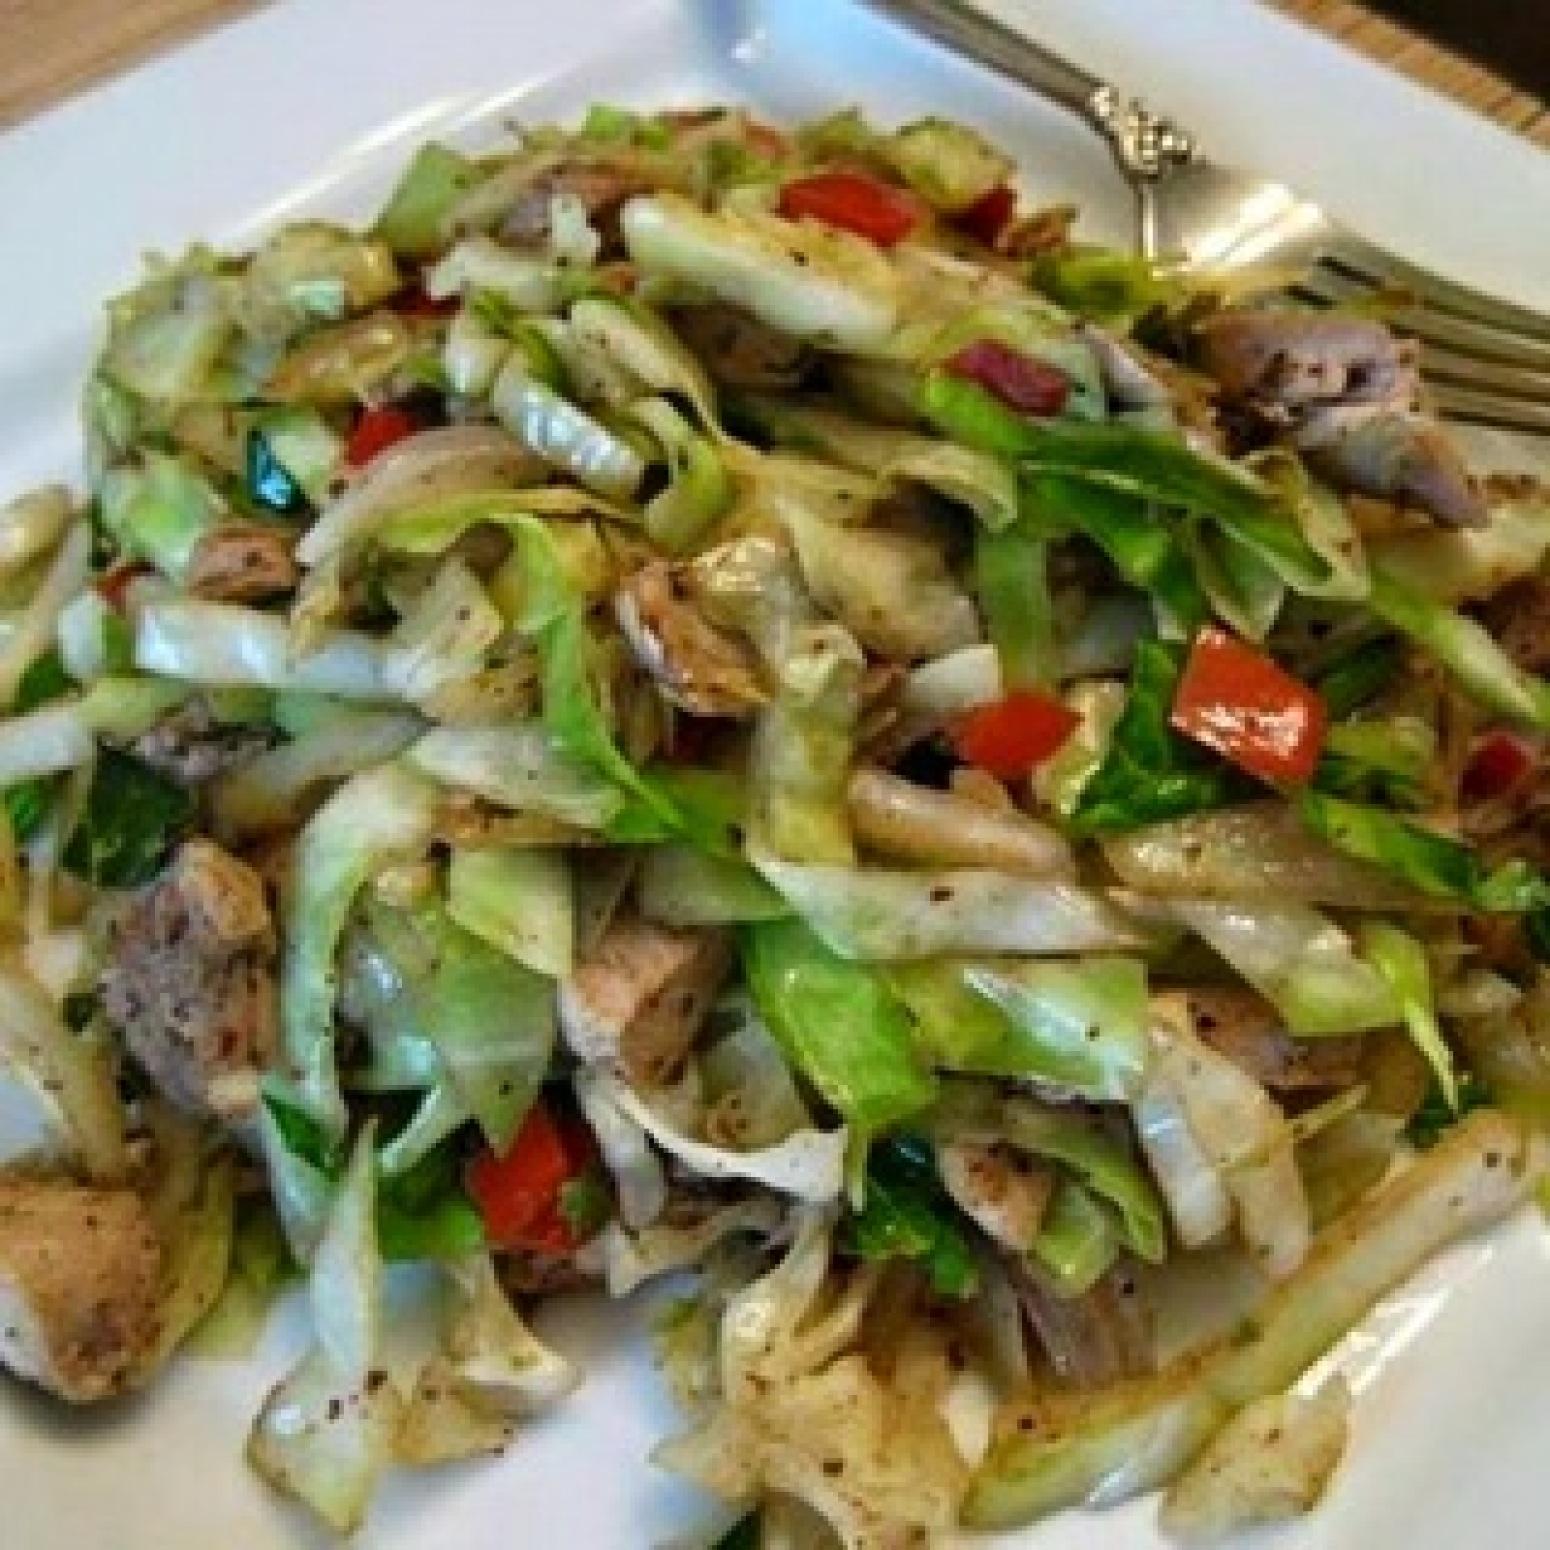 Red Cabbage And Fried Mortadella Okonomiyaki Recipes: CHICKEN AND CABBAGE Recipe